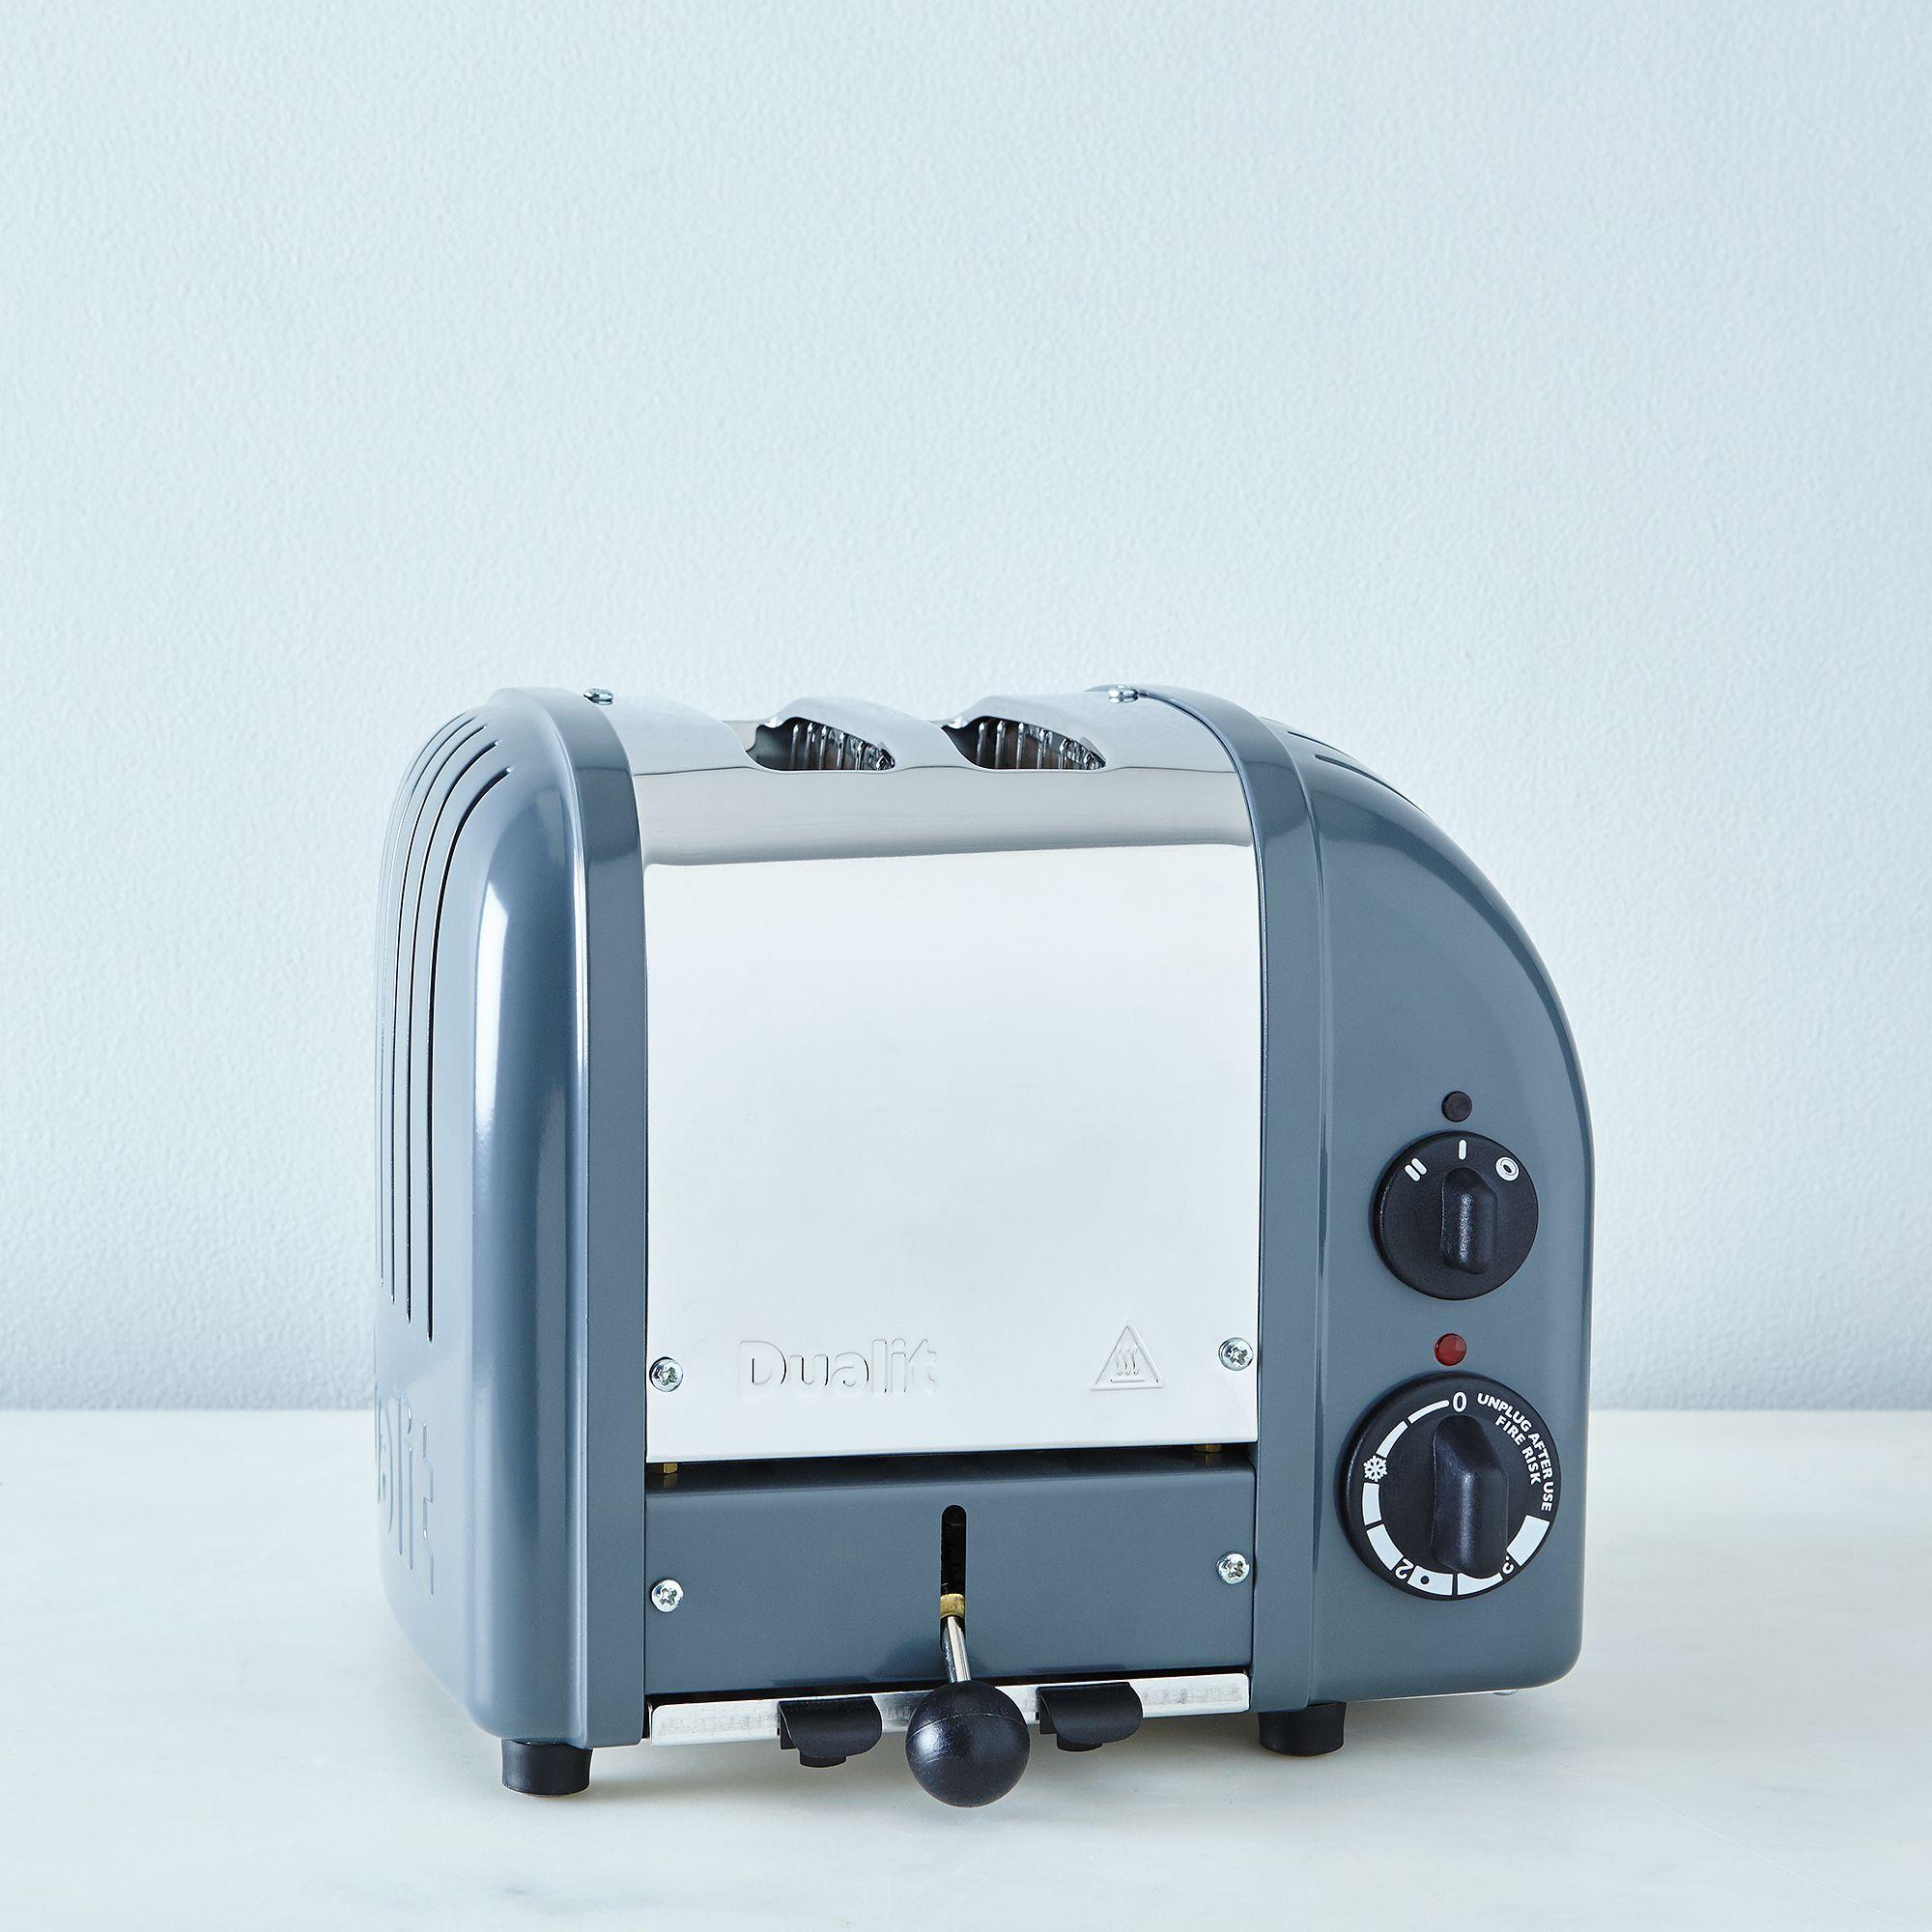 8bc4517f 8c76 4a80 bf2d c59058bbf58f  2016 0513 dualit toaster cobble grey 2 slice silo rocky luten 002